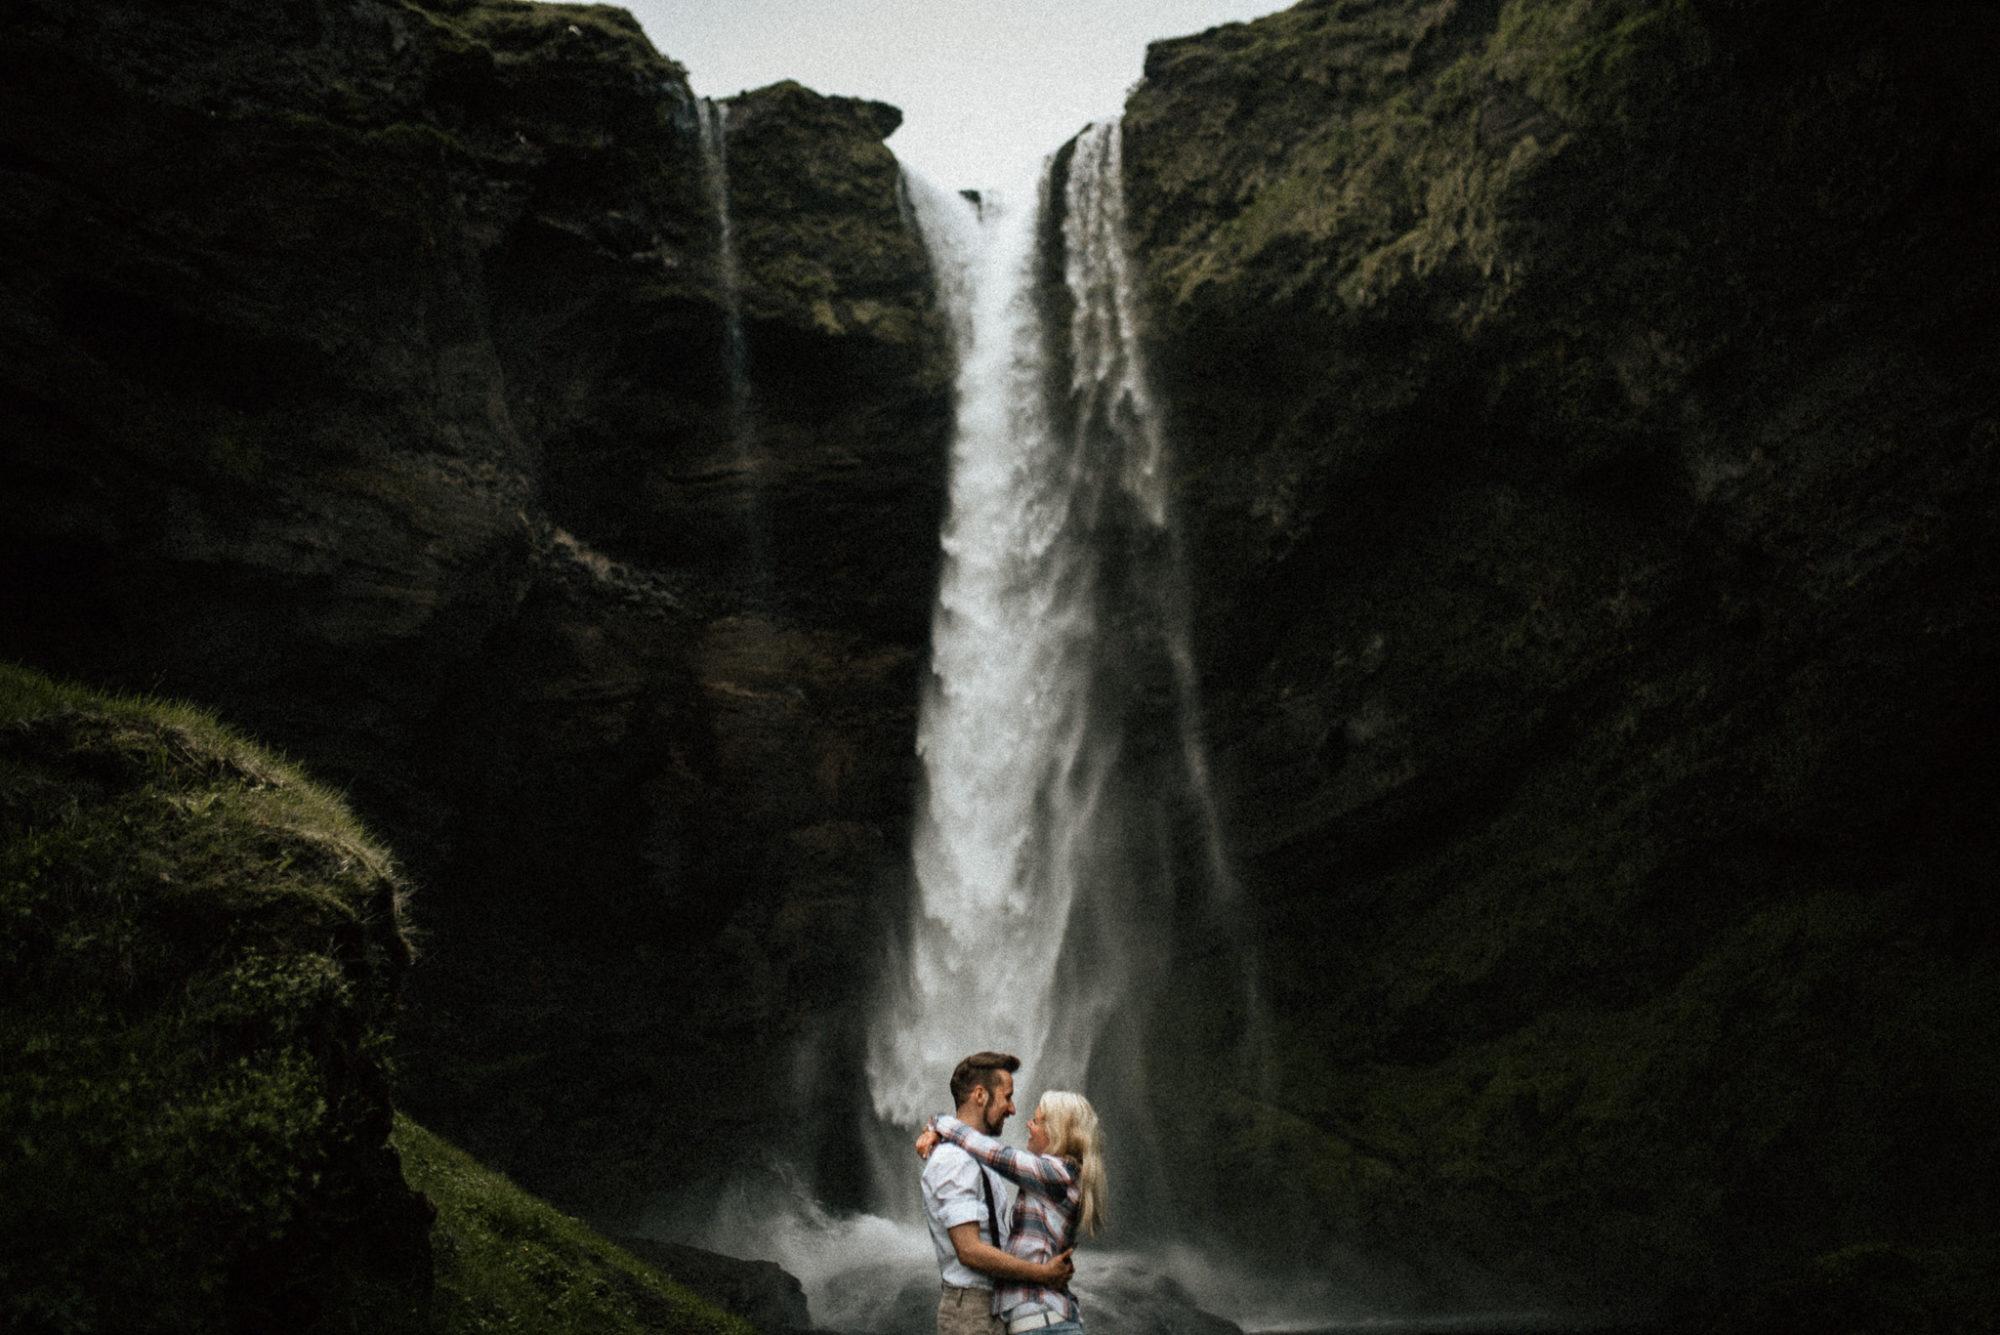 Hochzeitsantrag auf Island Timo Hess Fotografie Hochzeitsfotograf Würzburg